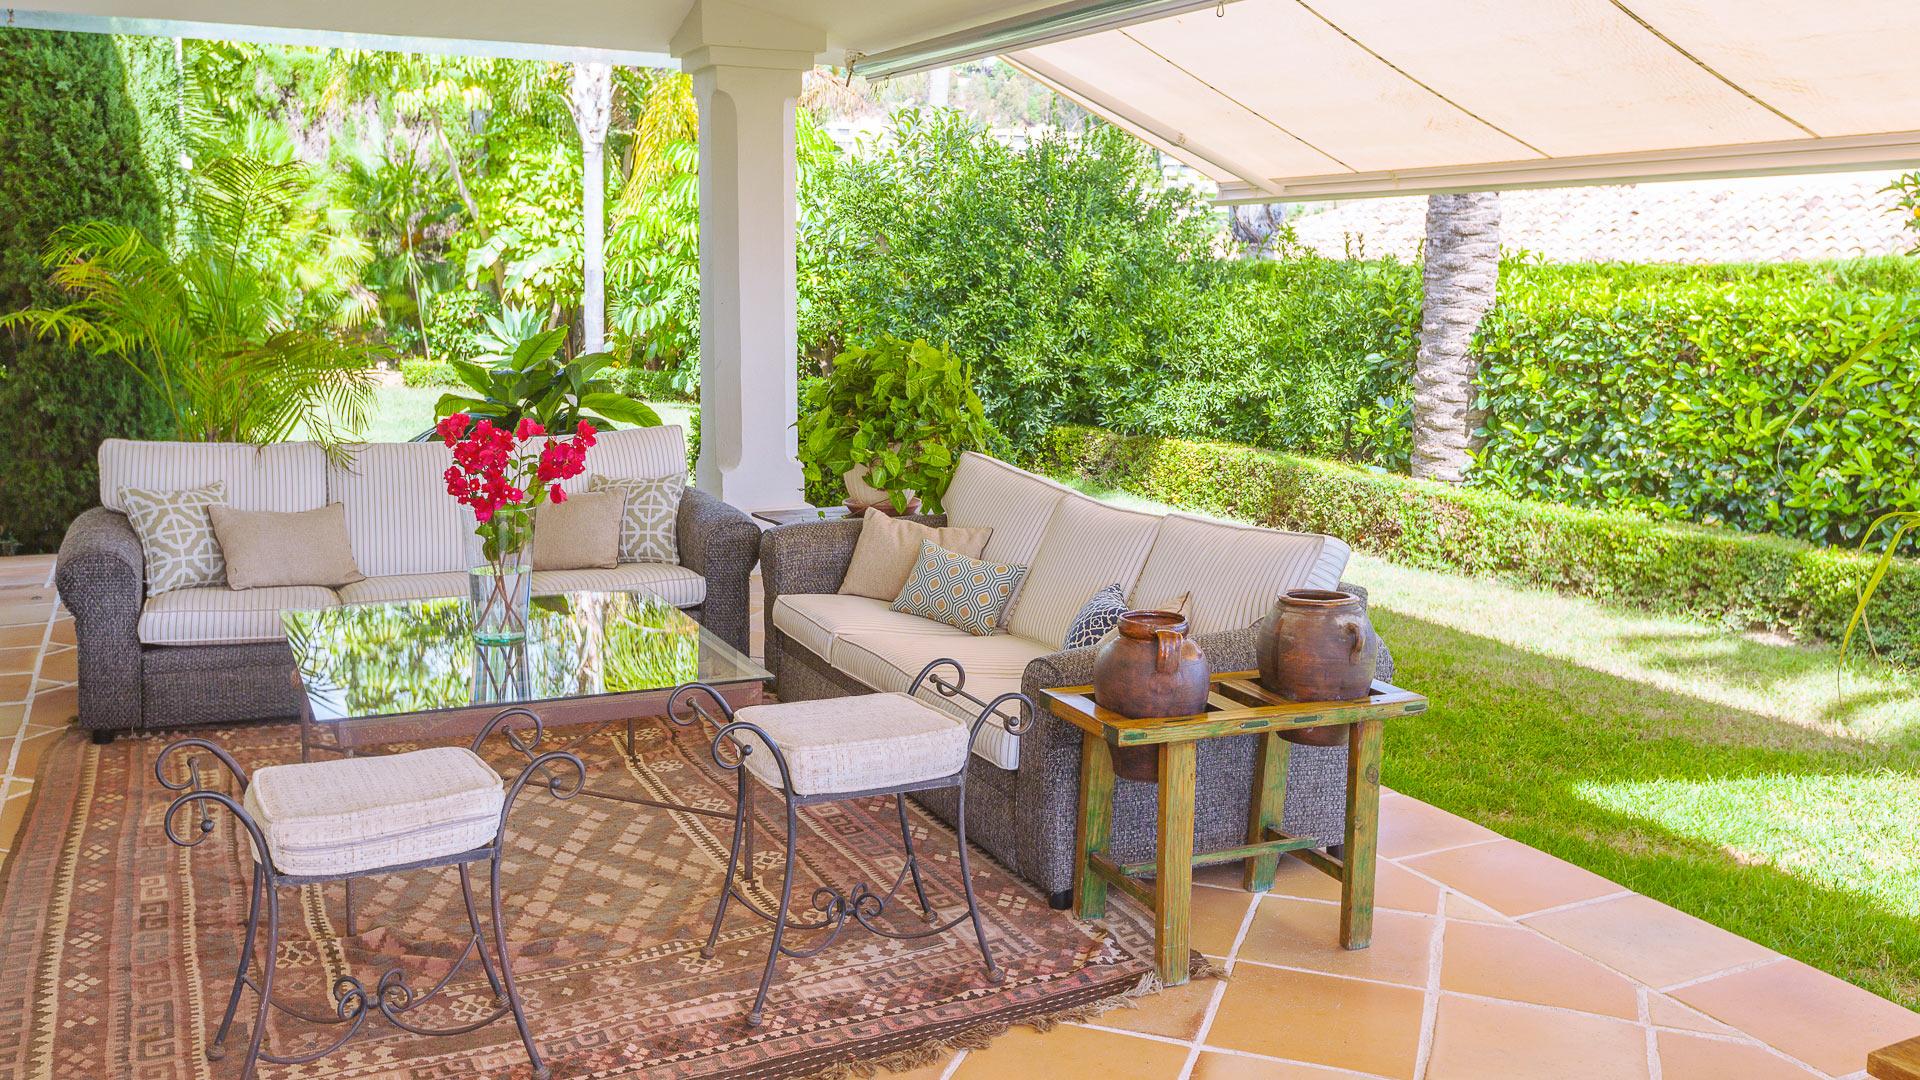 photos de la villa florencia andalousie villanovo. Black Bedroom Furniture Sets. Home Design Ideas